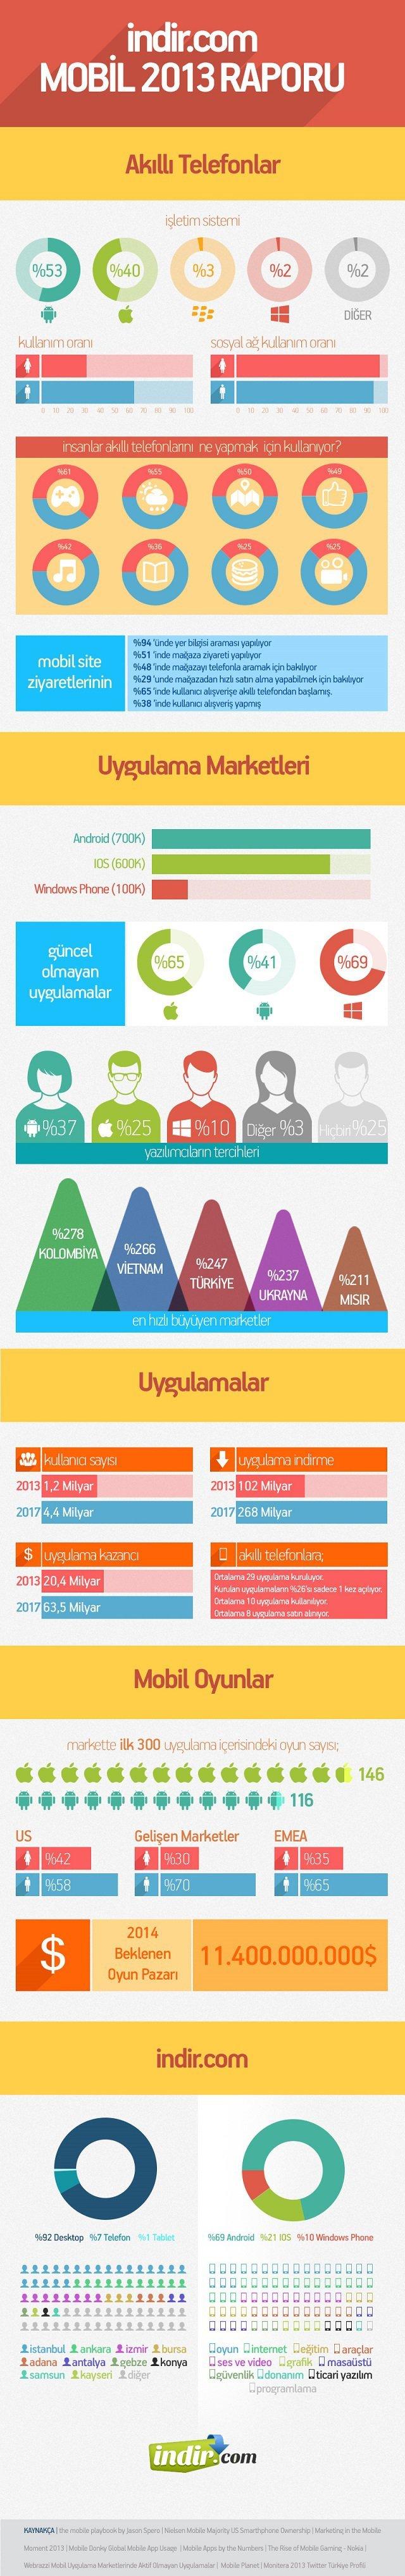 infografik_indir.com_mobil2013raporu